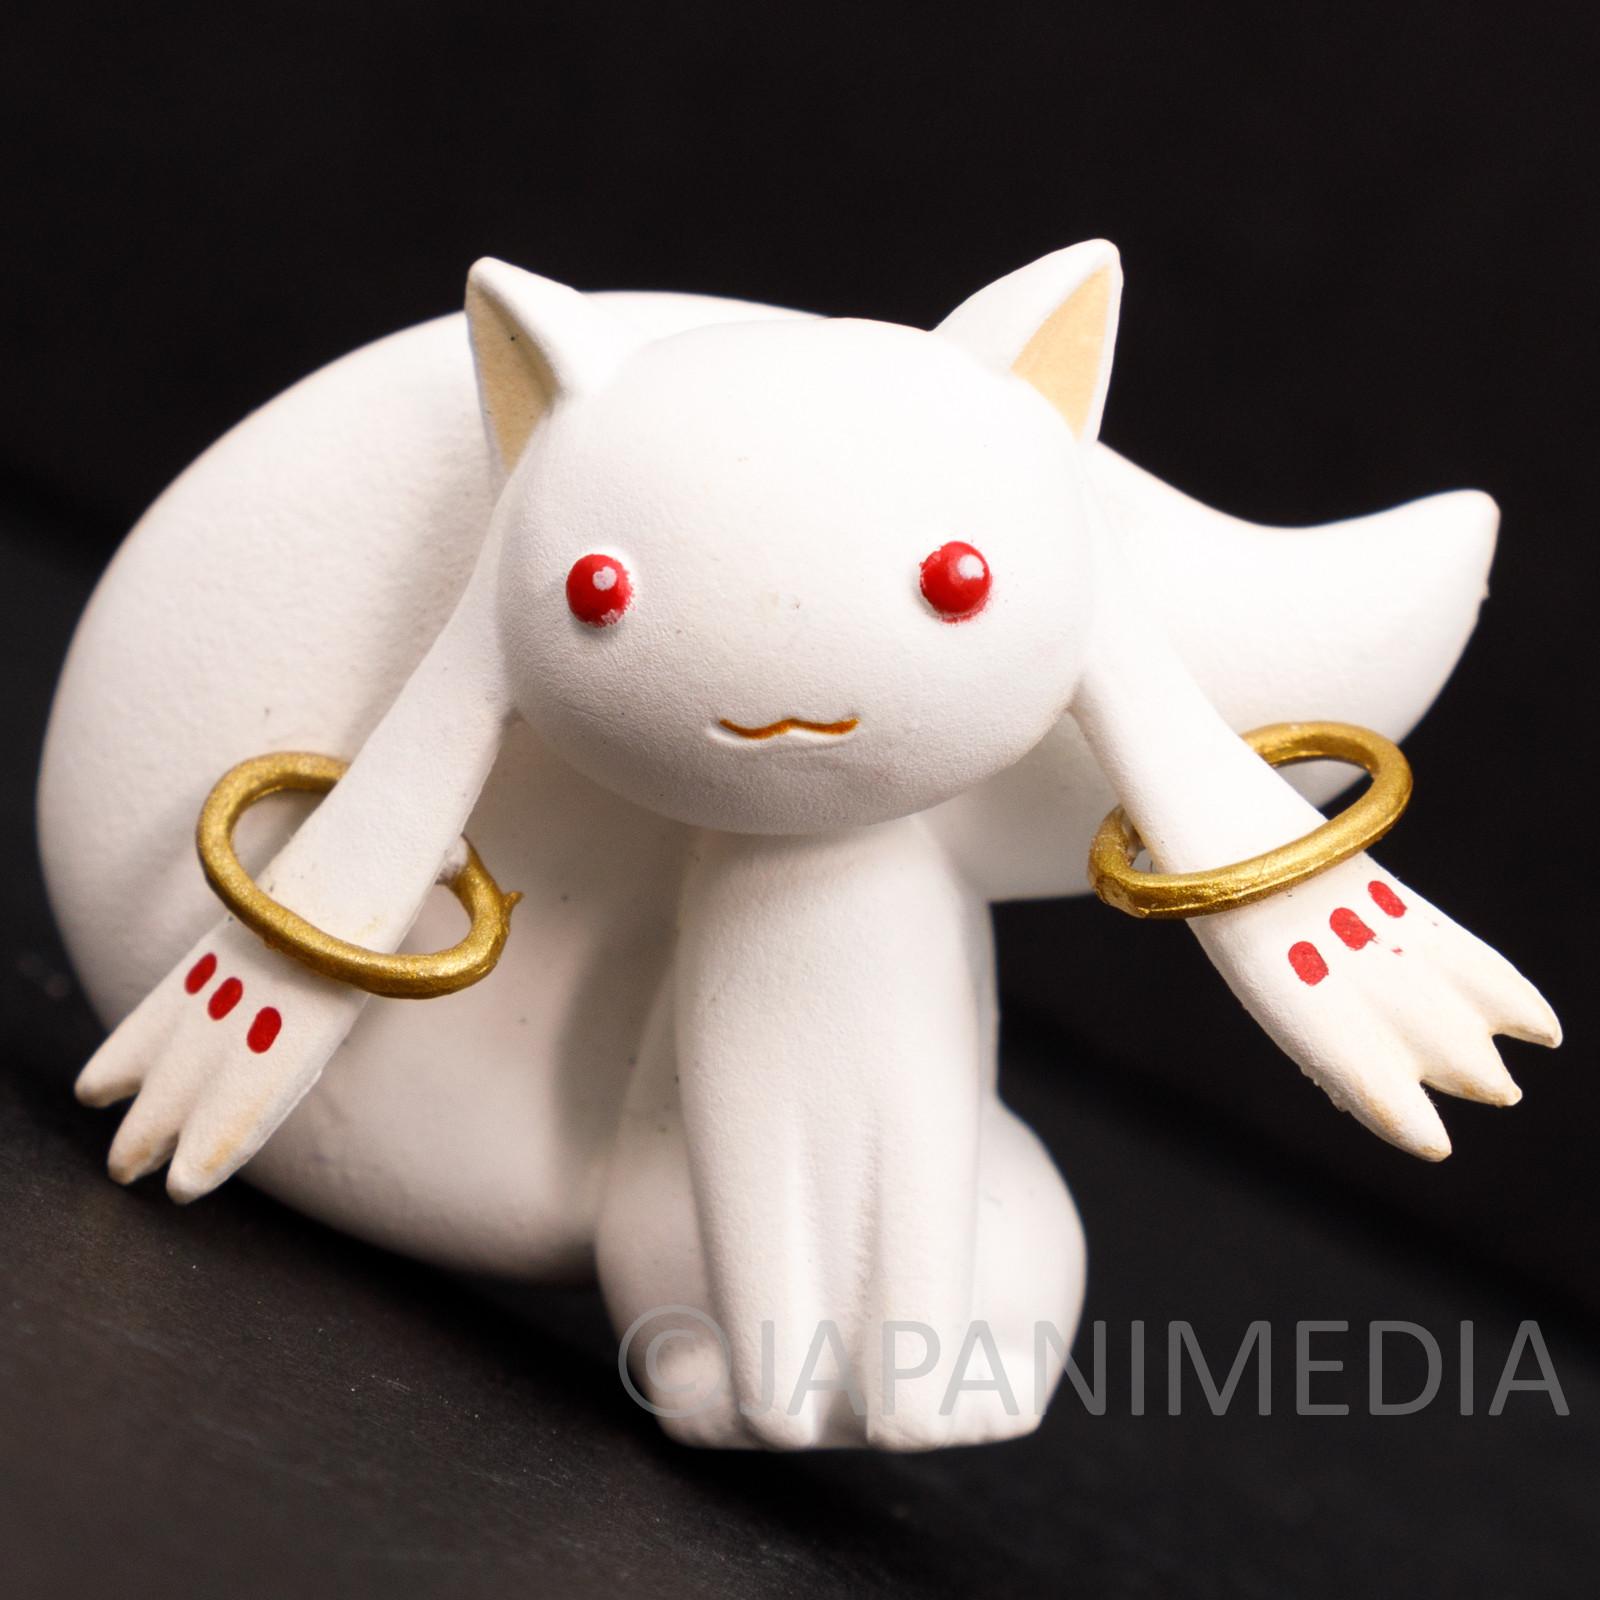 Puella Magi Madoka Kyubey Relief Mascot Magnet Takara Tomy JAPAN ANIME